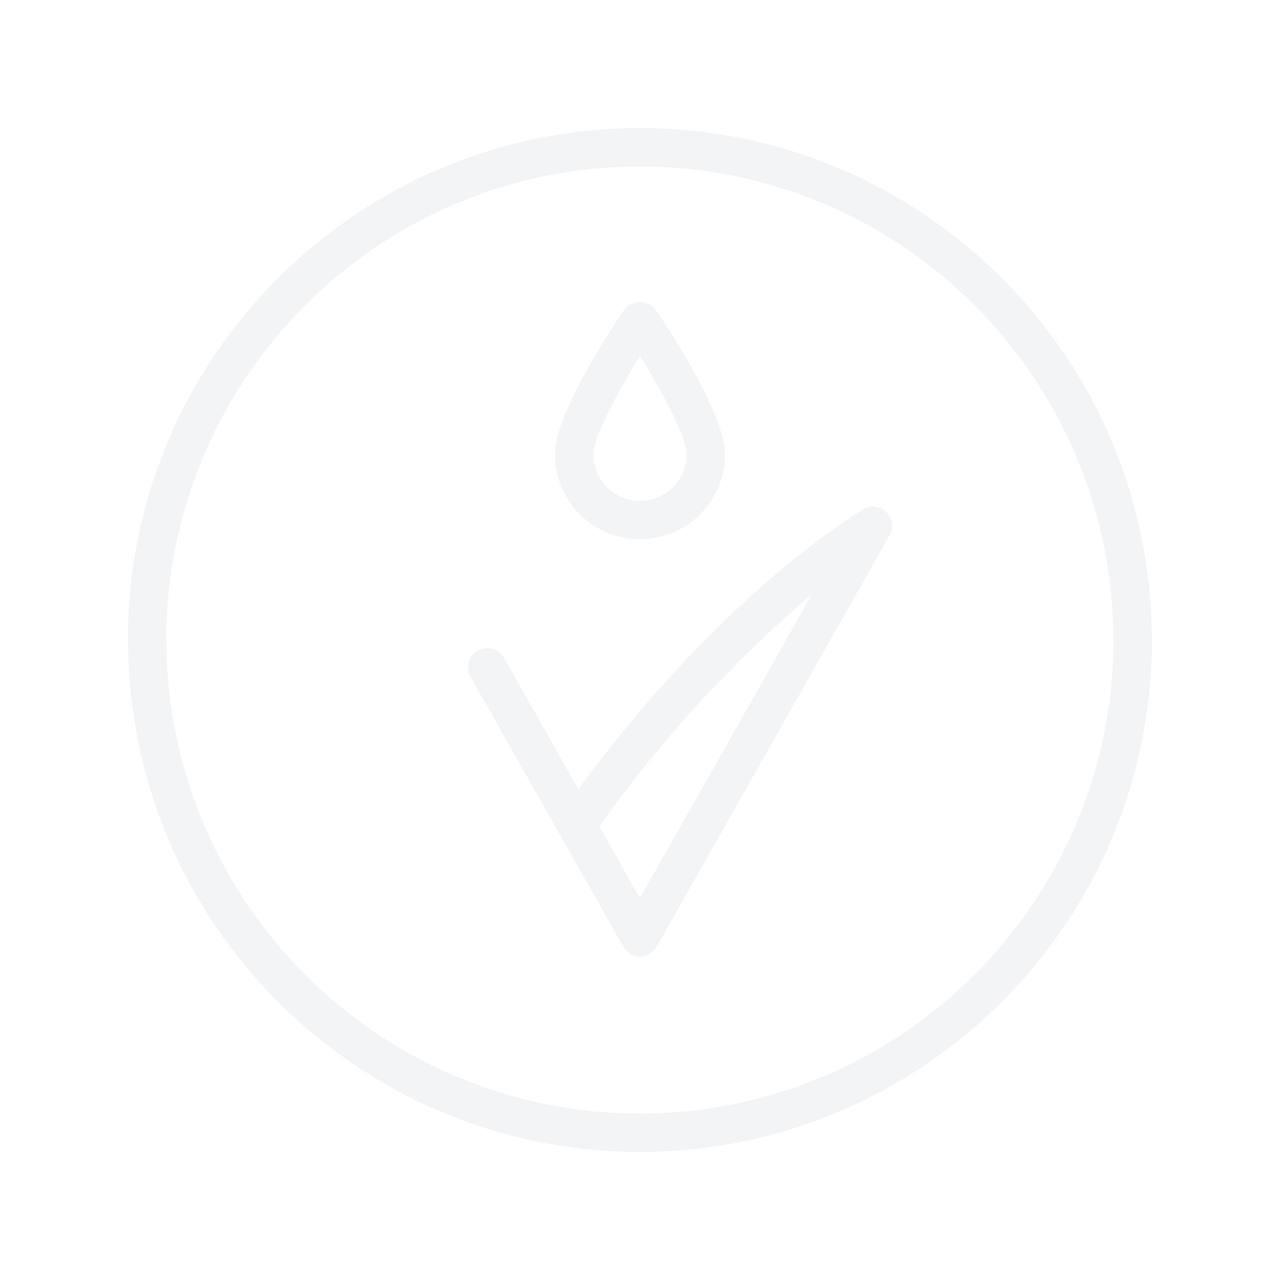 COLLISTAR Anticellulite Draining Gel-Mud дренажный антицеллюлитный гель 400ml